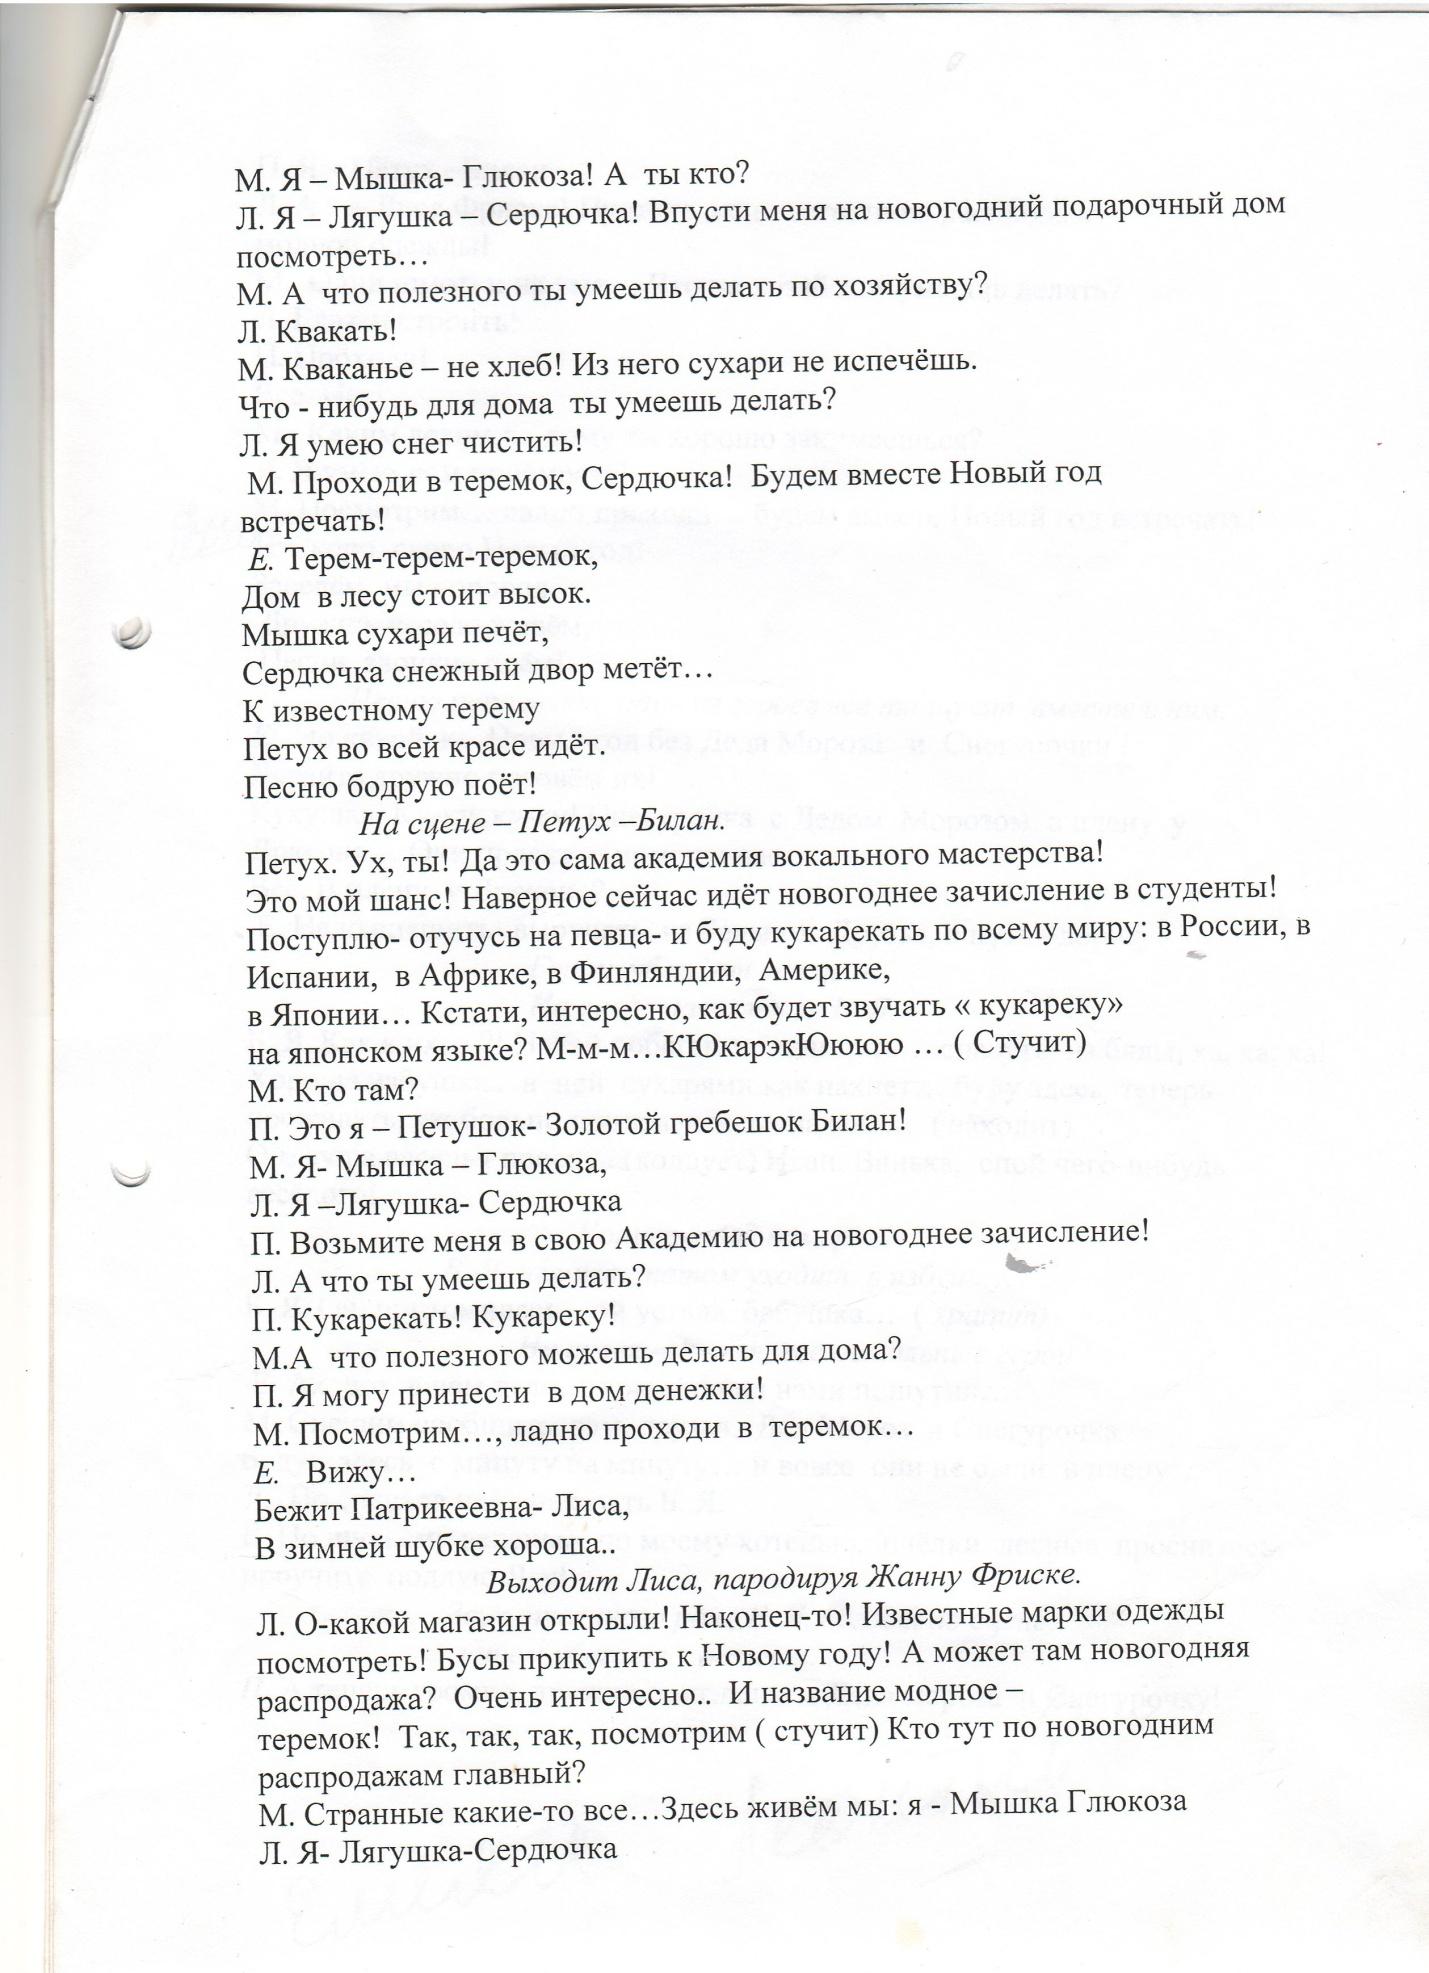 C:\Users\Sof\AppData\Roaming\Skype\My Skype Received Files\scan 3(2).jpg